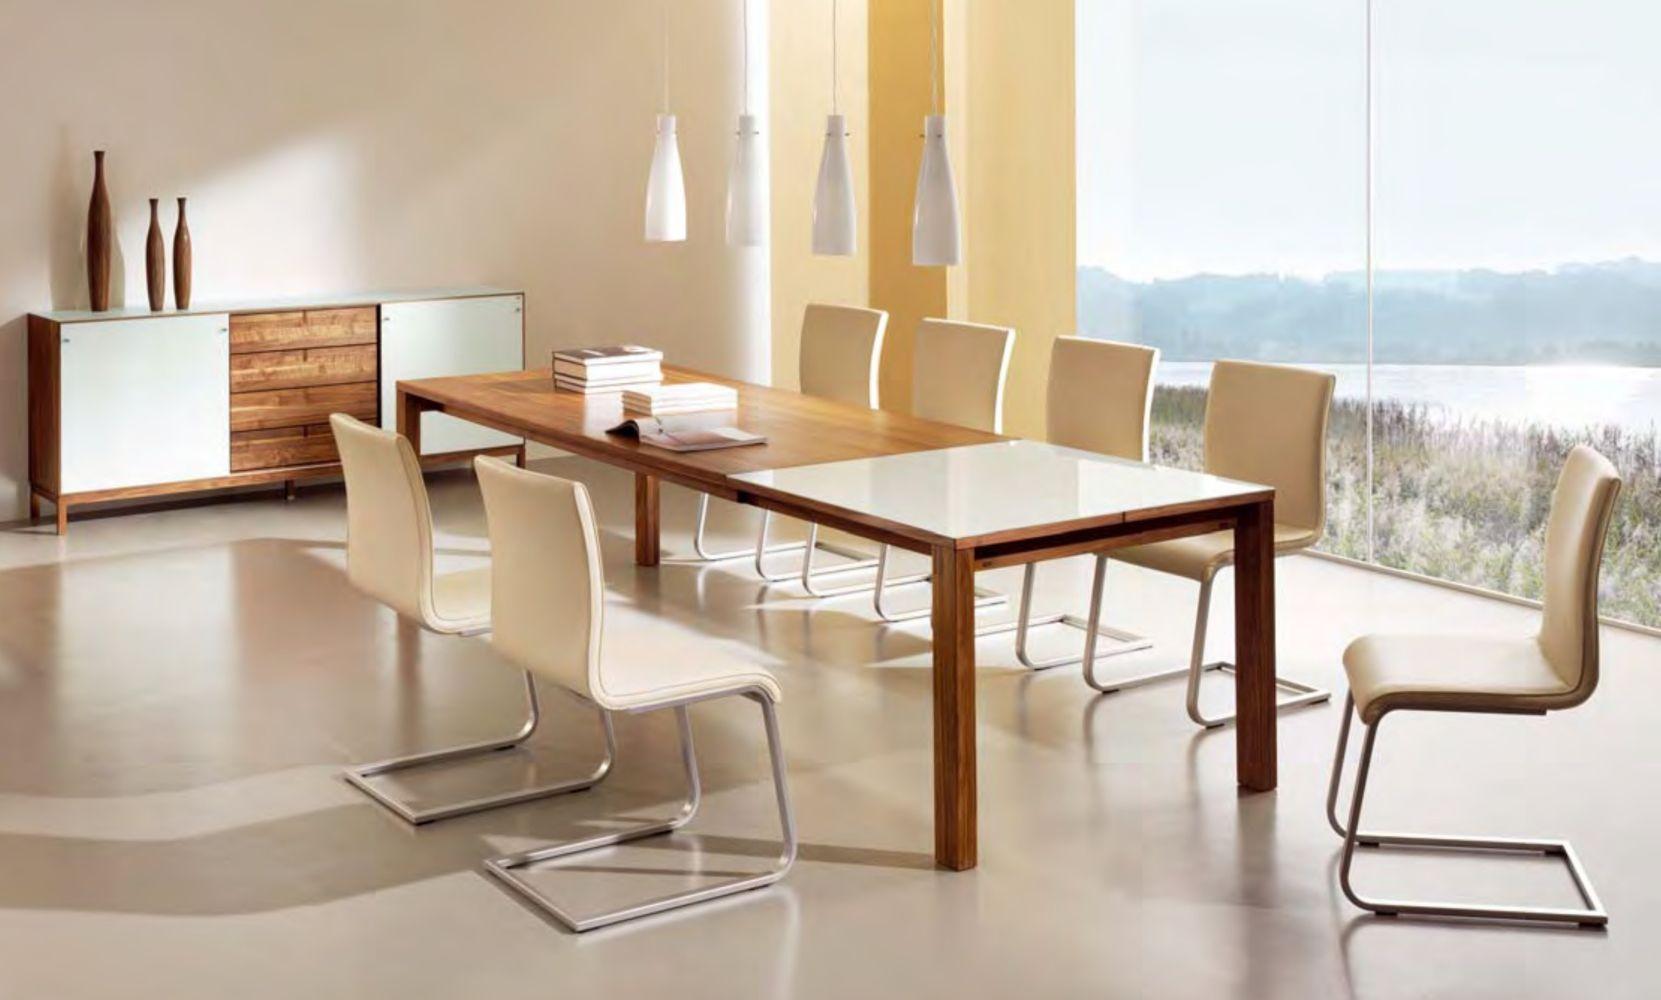 Appunti Di Feng Shui: Sala Da Pranzo Arredativo Design Magazine #3D1E14 1661 1000 La Sala Da Pranzo Wordreference